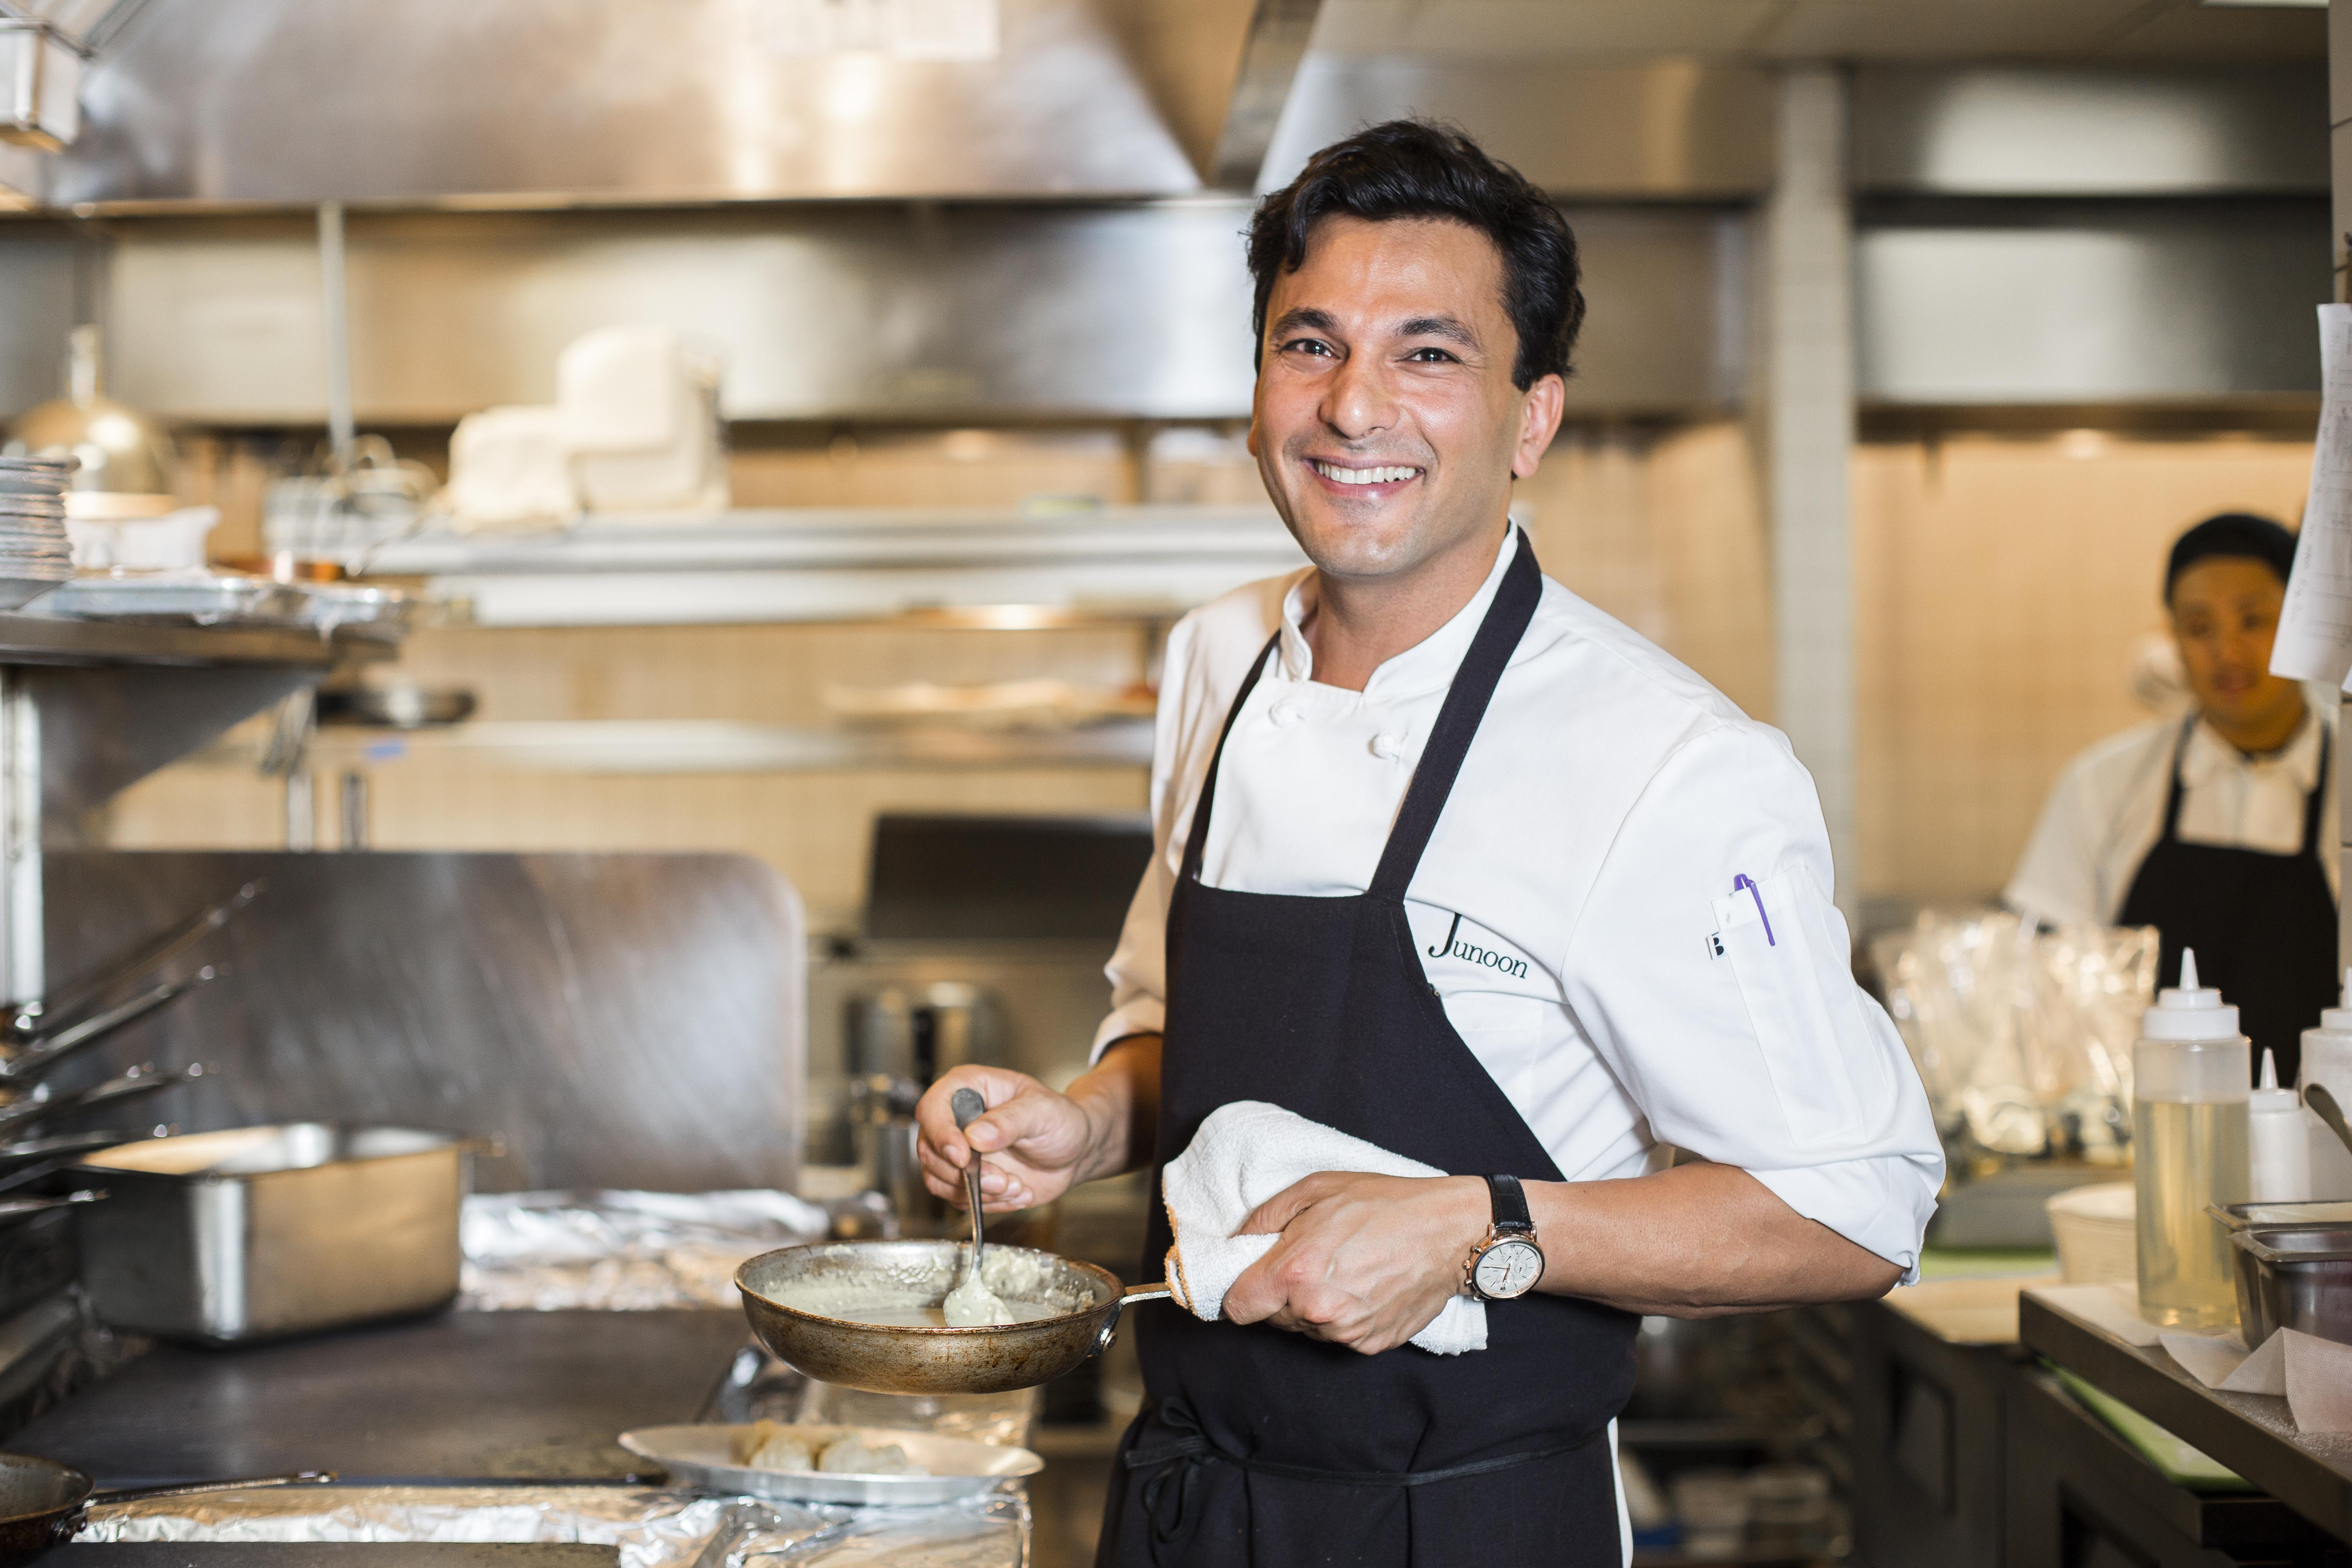 Chef Vikas Khanna. (Samira Bouaou/Epoch Times)